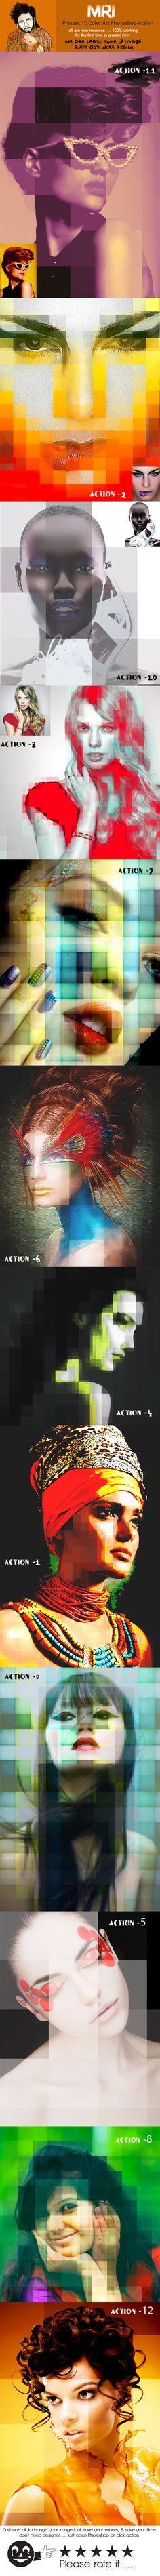 Paixgel art — Photoshop ATN #premium effects #photos • Available here → https://graphicriver.net/item/paixgel-art/7851741?ref=pxcr